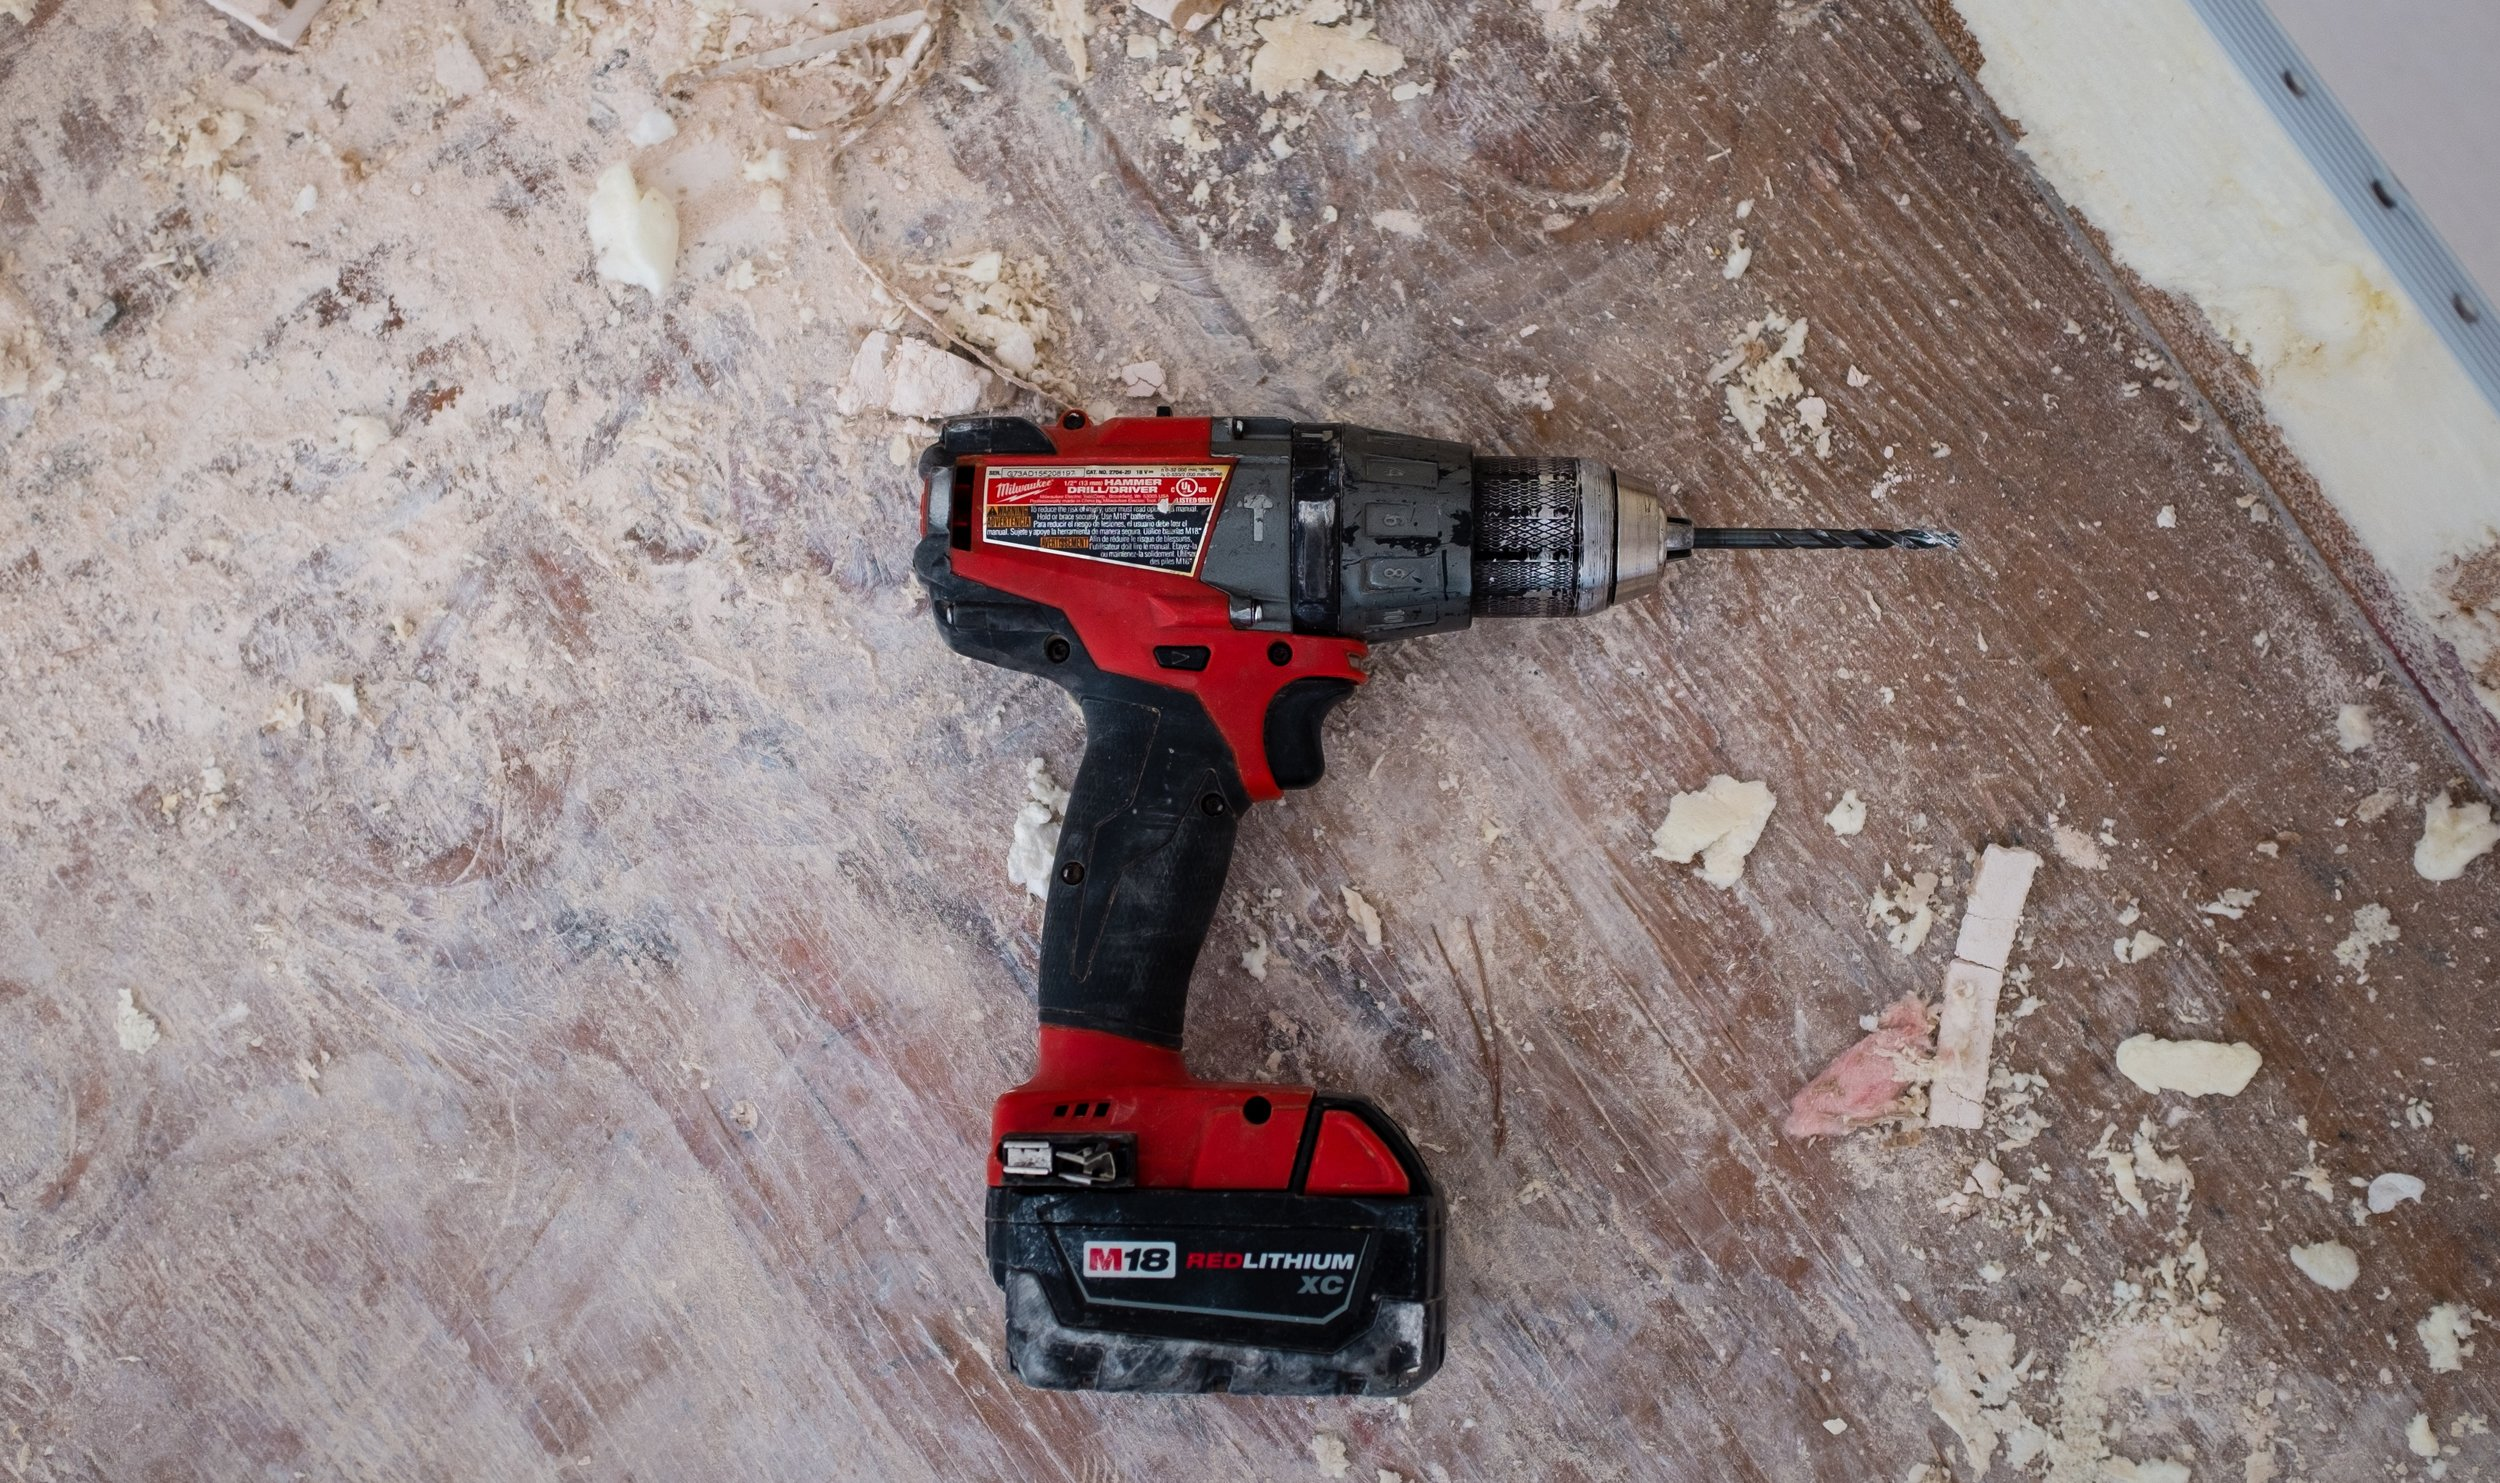 Power drill DIY Home renovations.jpg